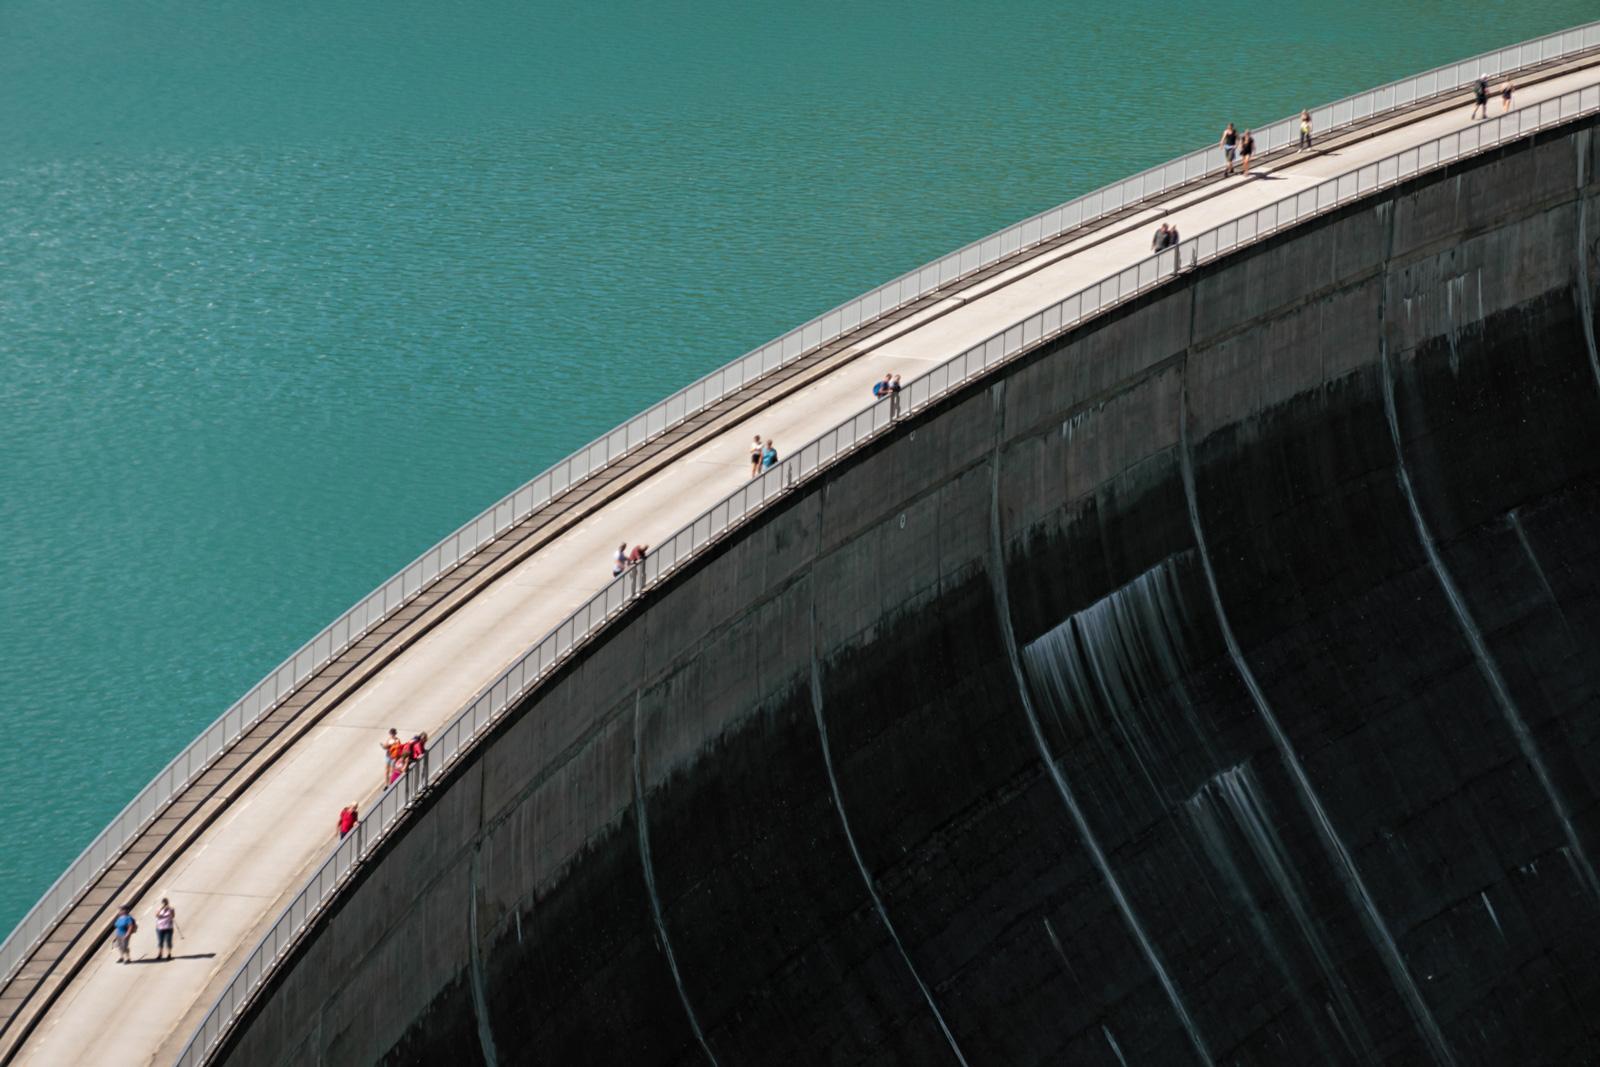 Stausee Mooserboden Damm, Kaprun